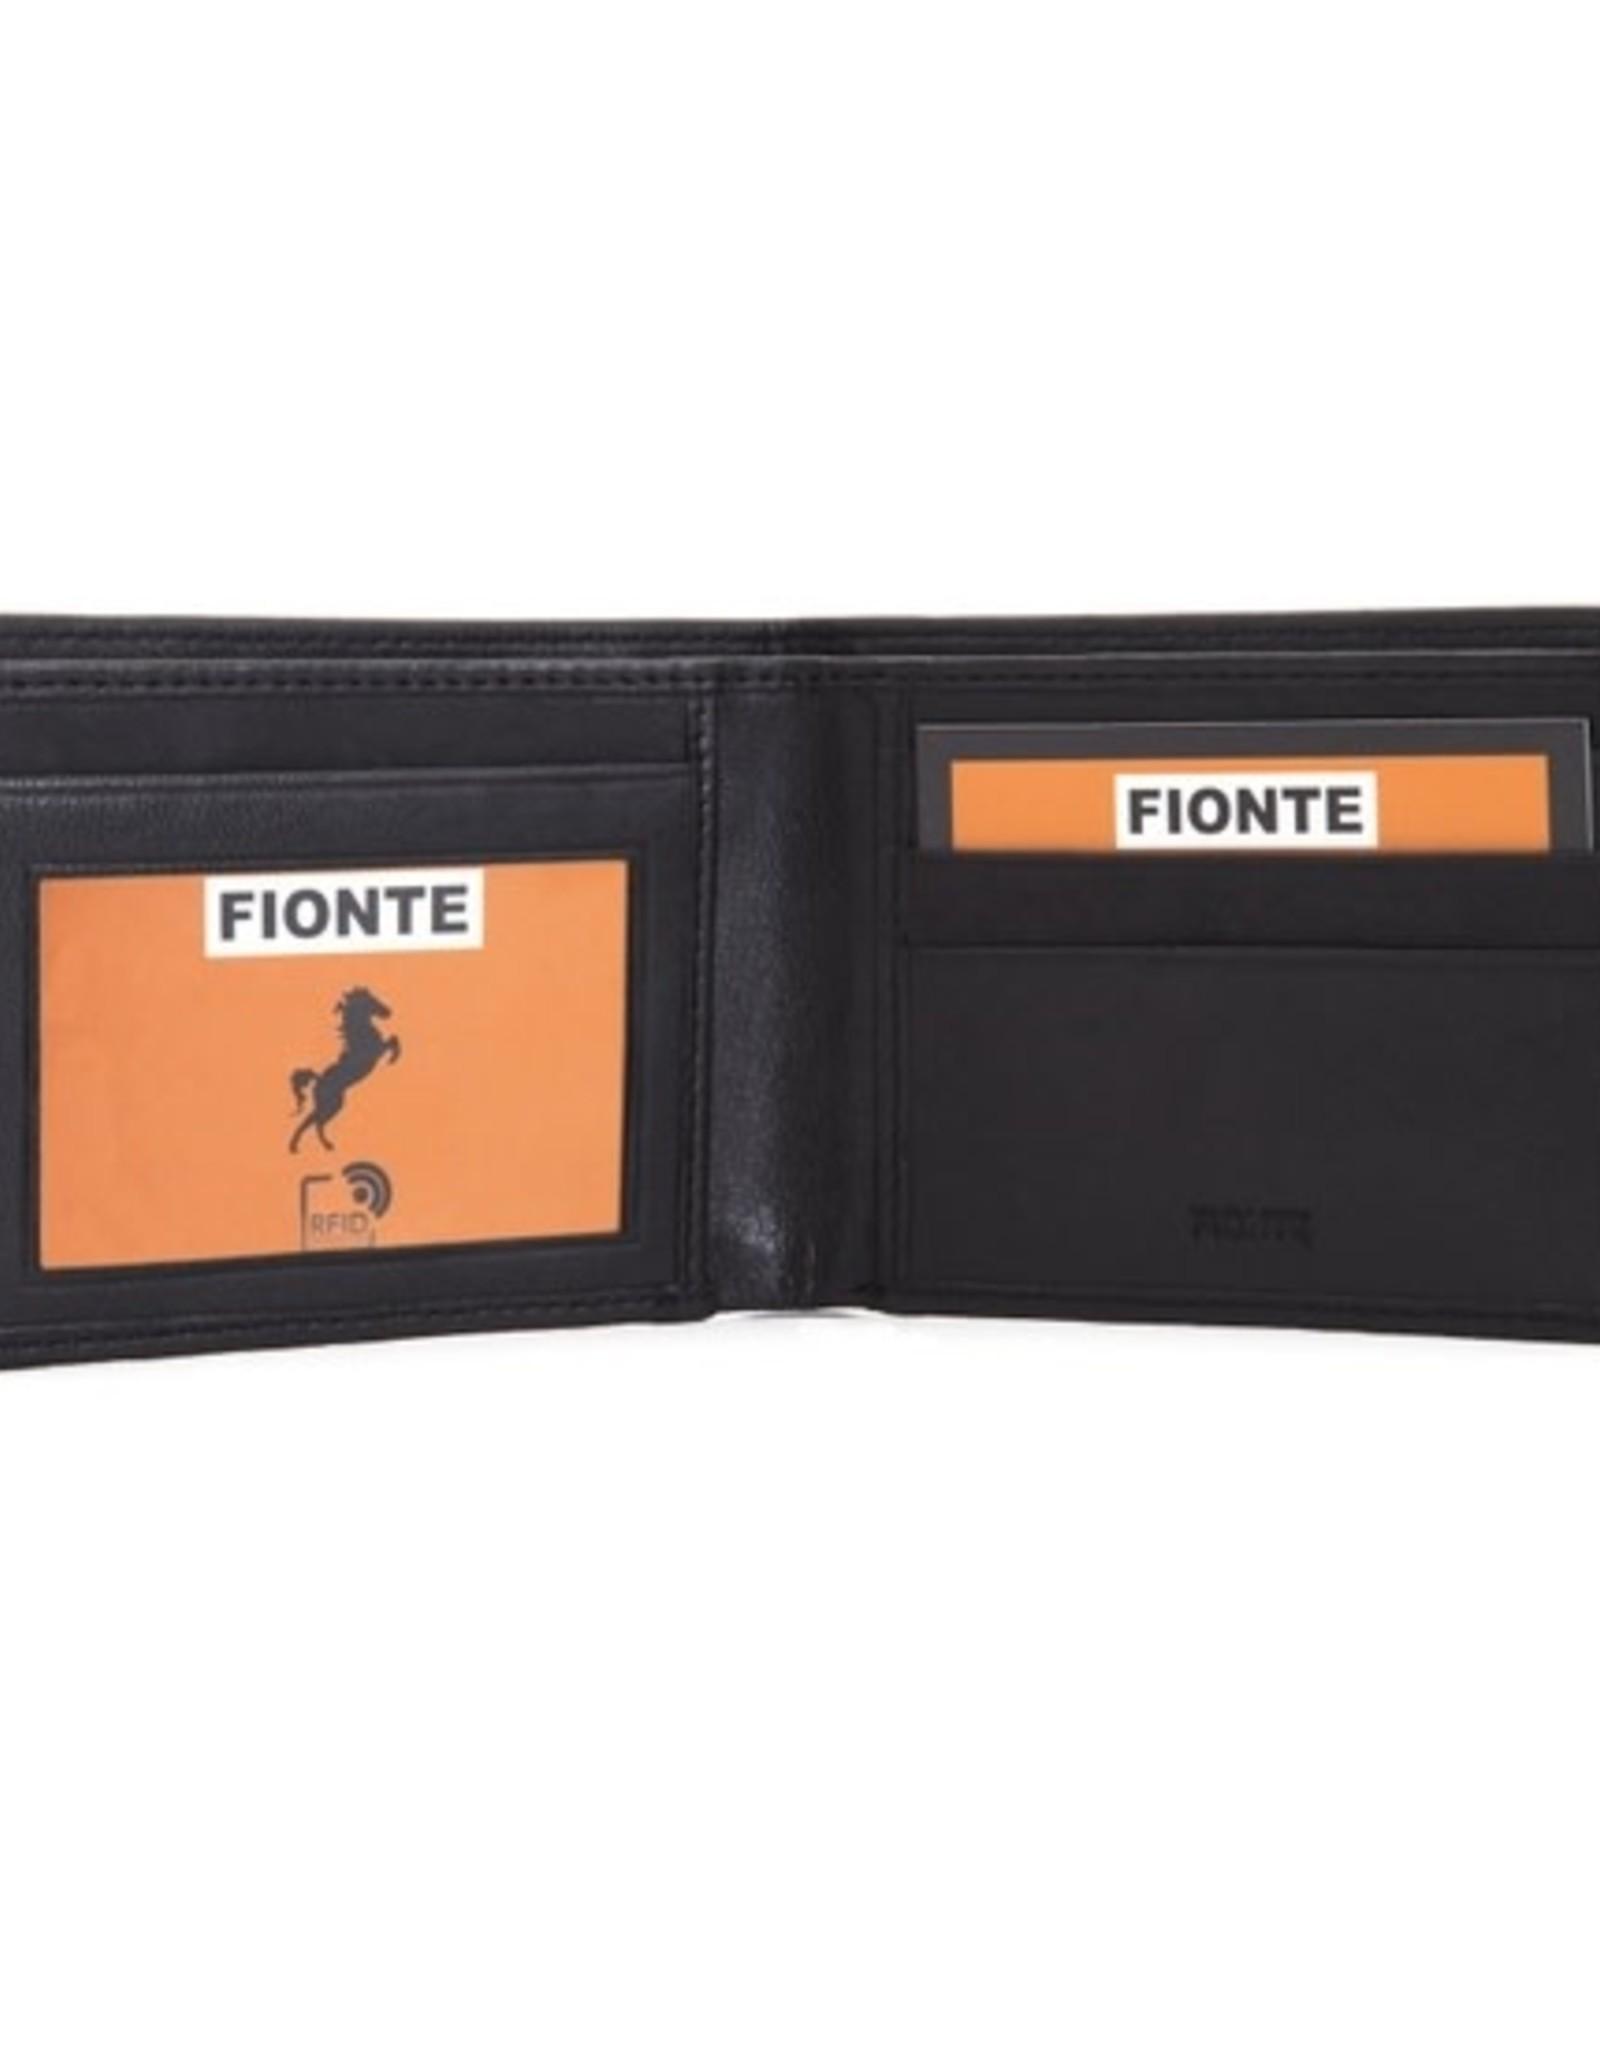 Faire/Fionti WALLET-LEATHER RFID 2 FOLD W/WINDOW BLK